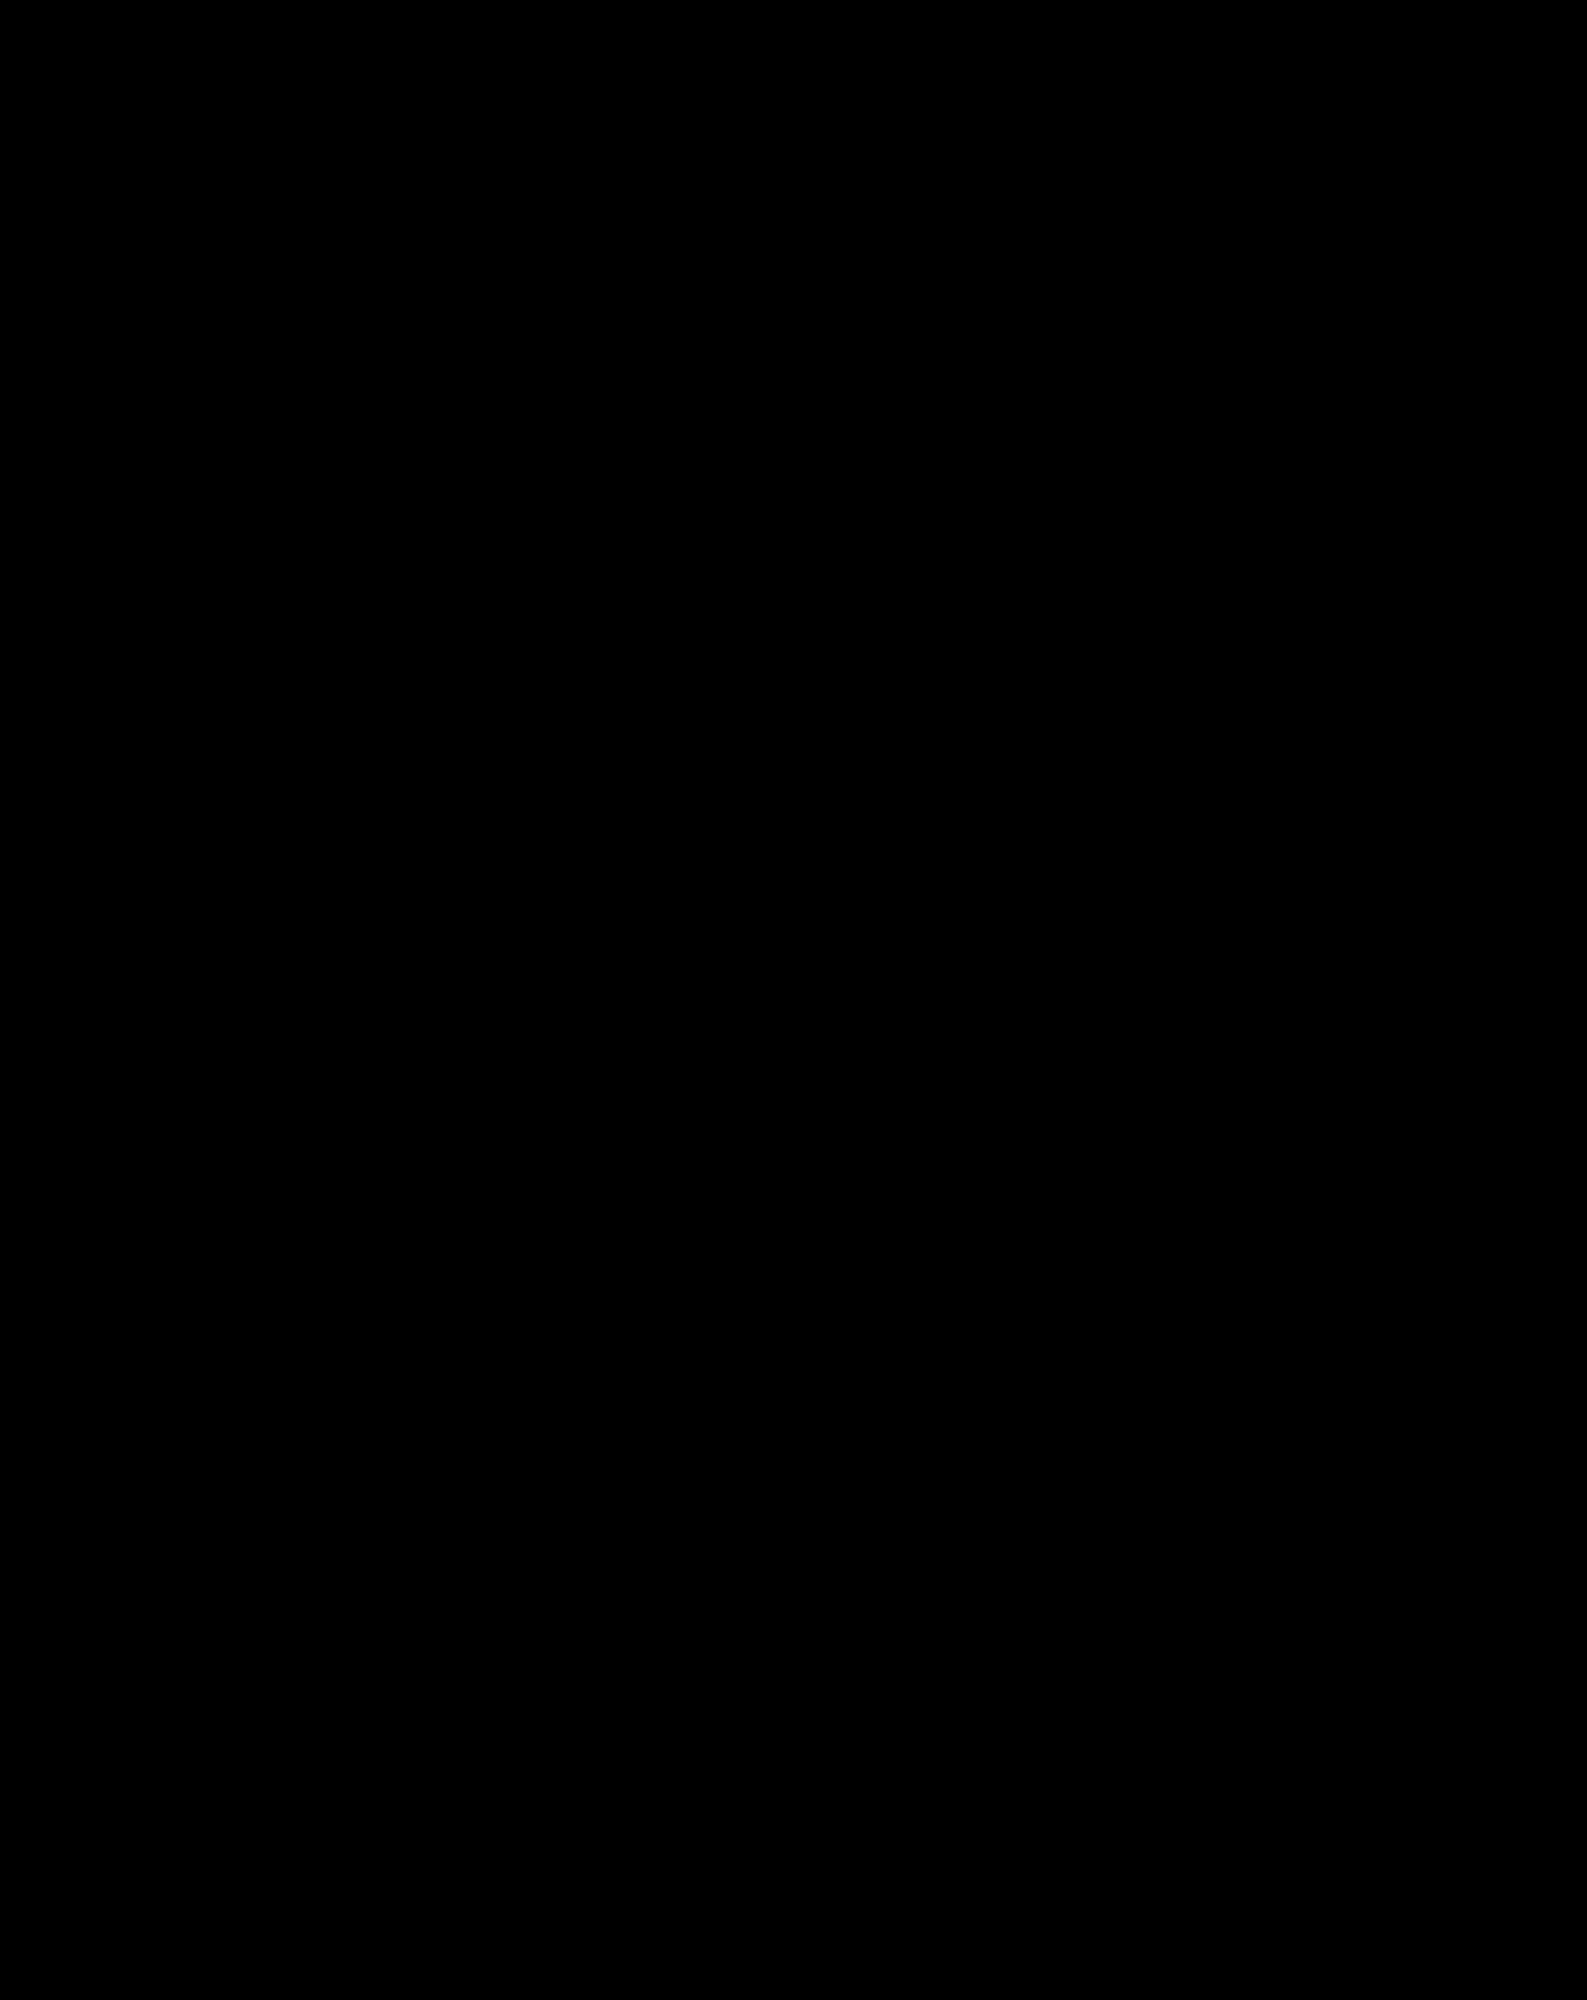 logo-black 1.png